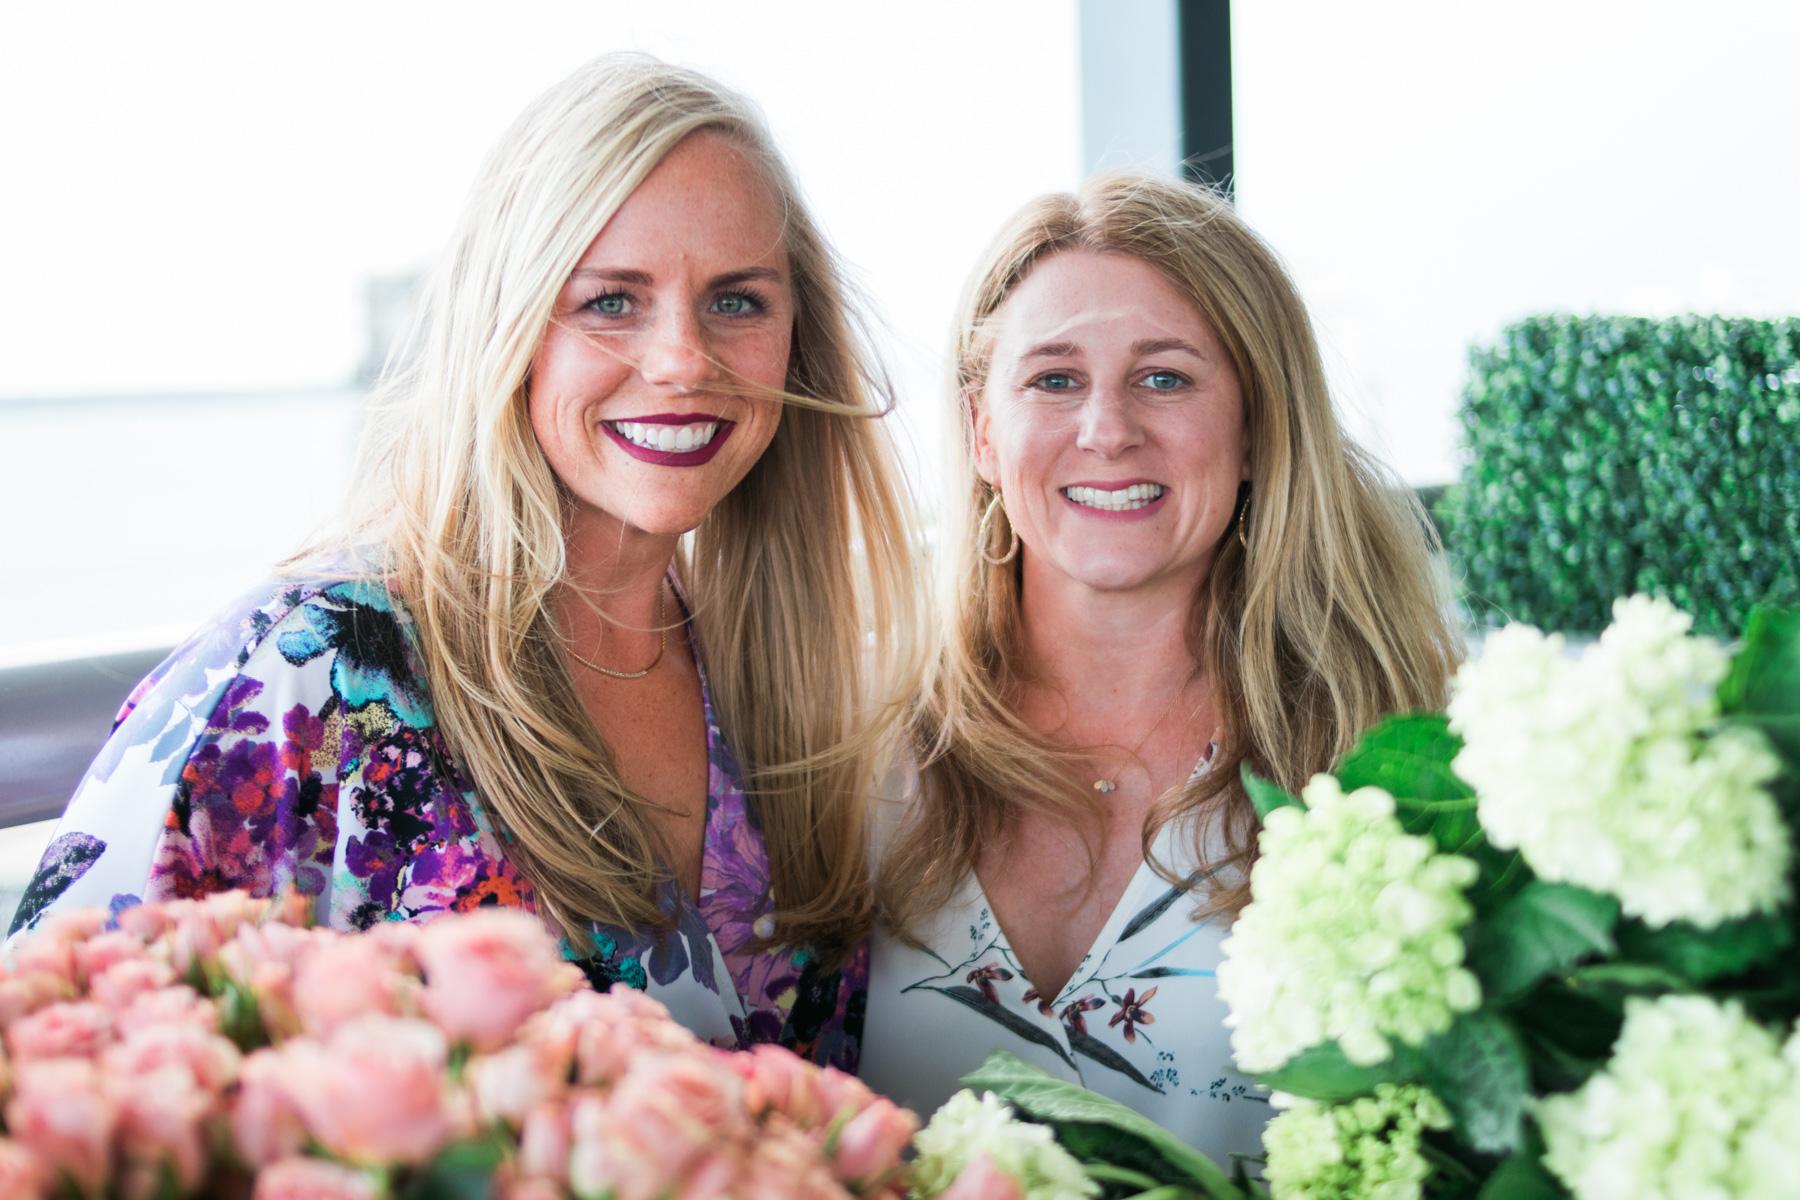 Megan Kilis and Vicky Lane, bloggers at Jacksonville Moms Blog